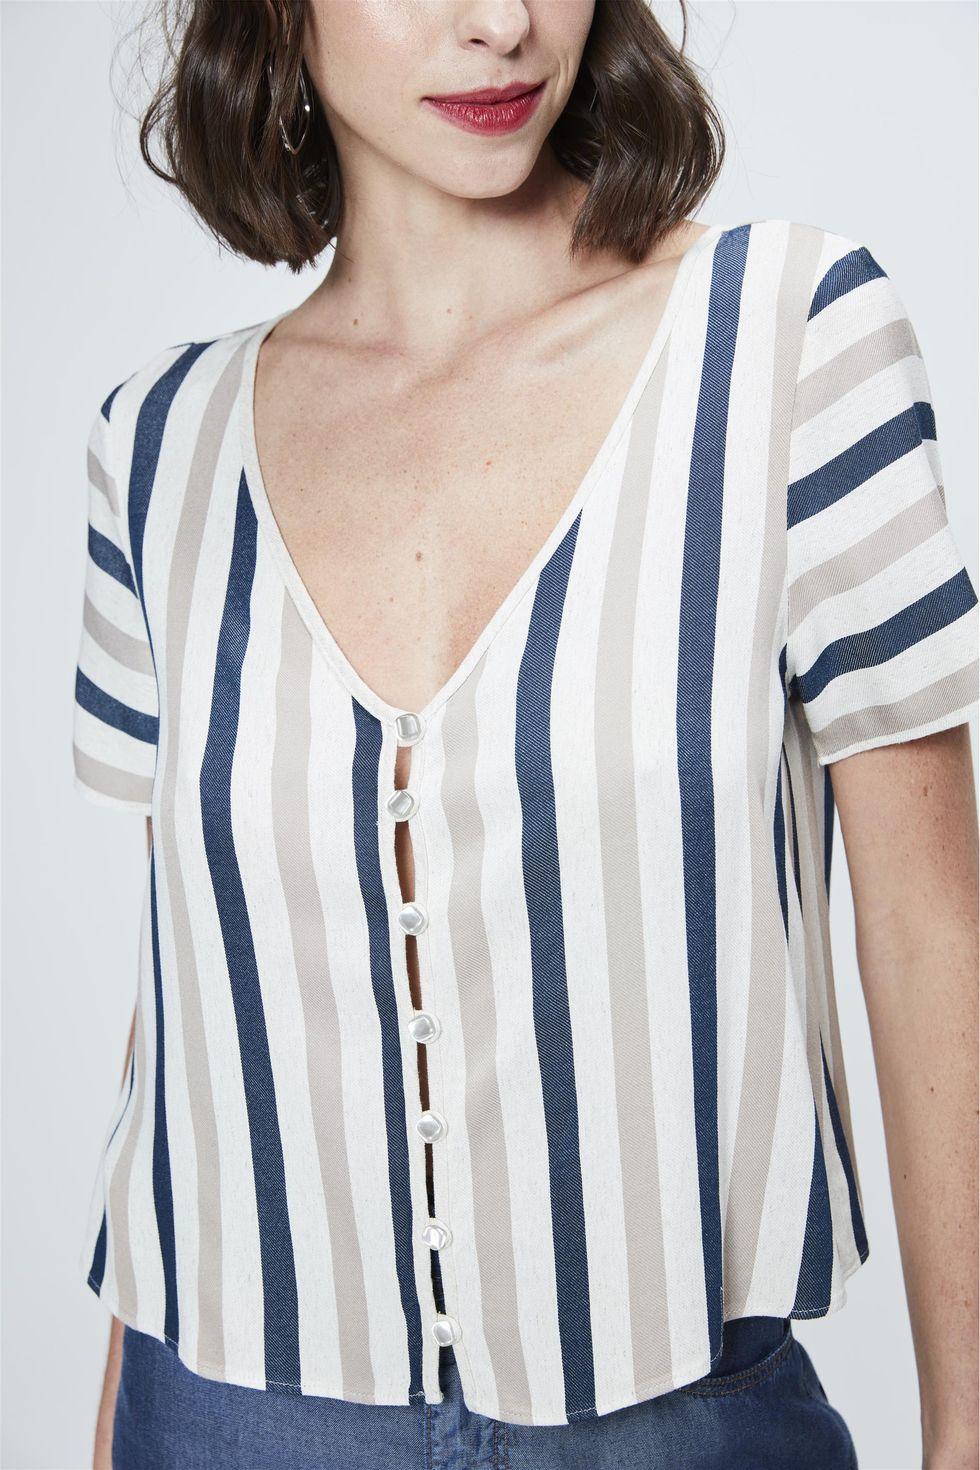 Camisa-Cropped-Listrada-Feminina-Frente--